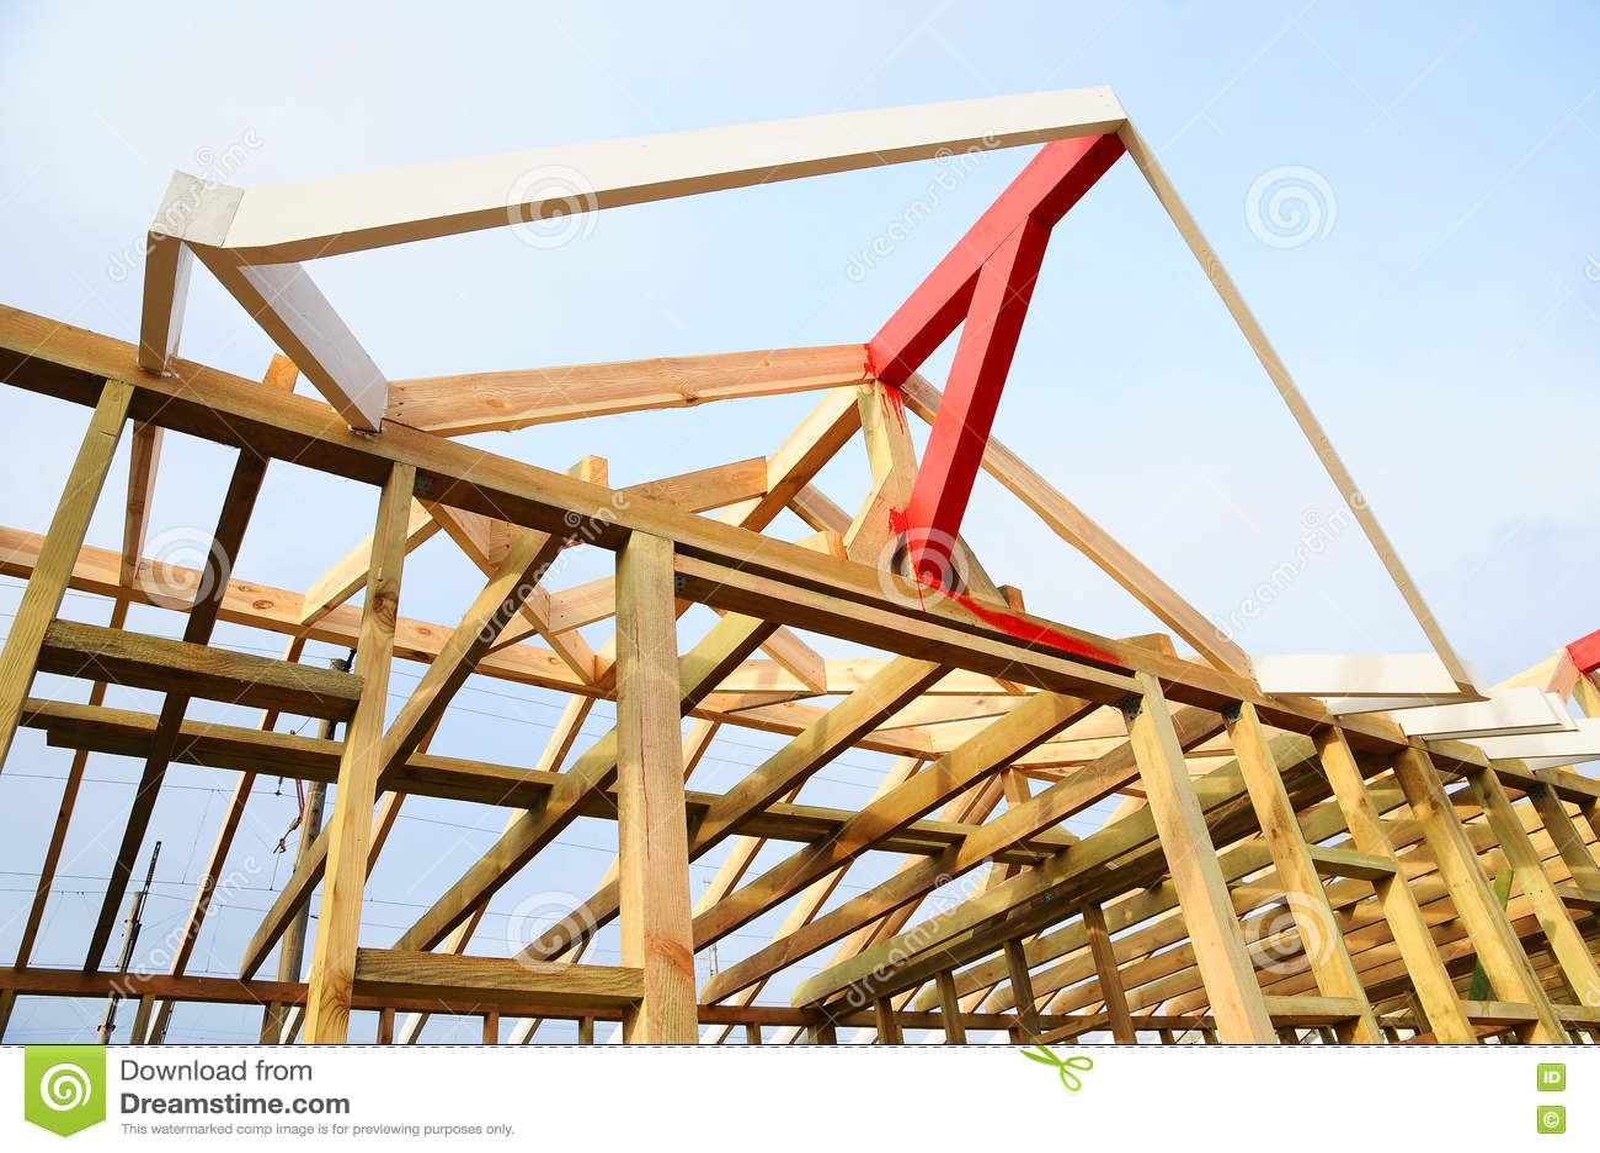 Casas con estructura de madera affordable estructura de - Casas estructura de madera ...